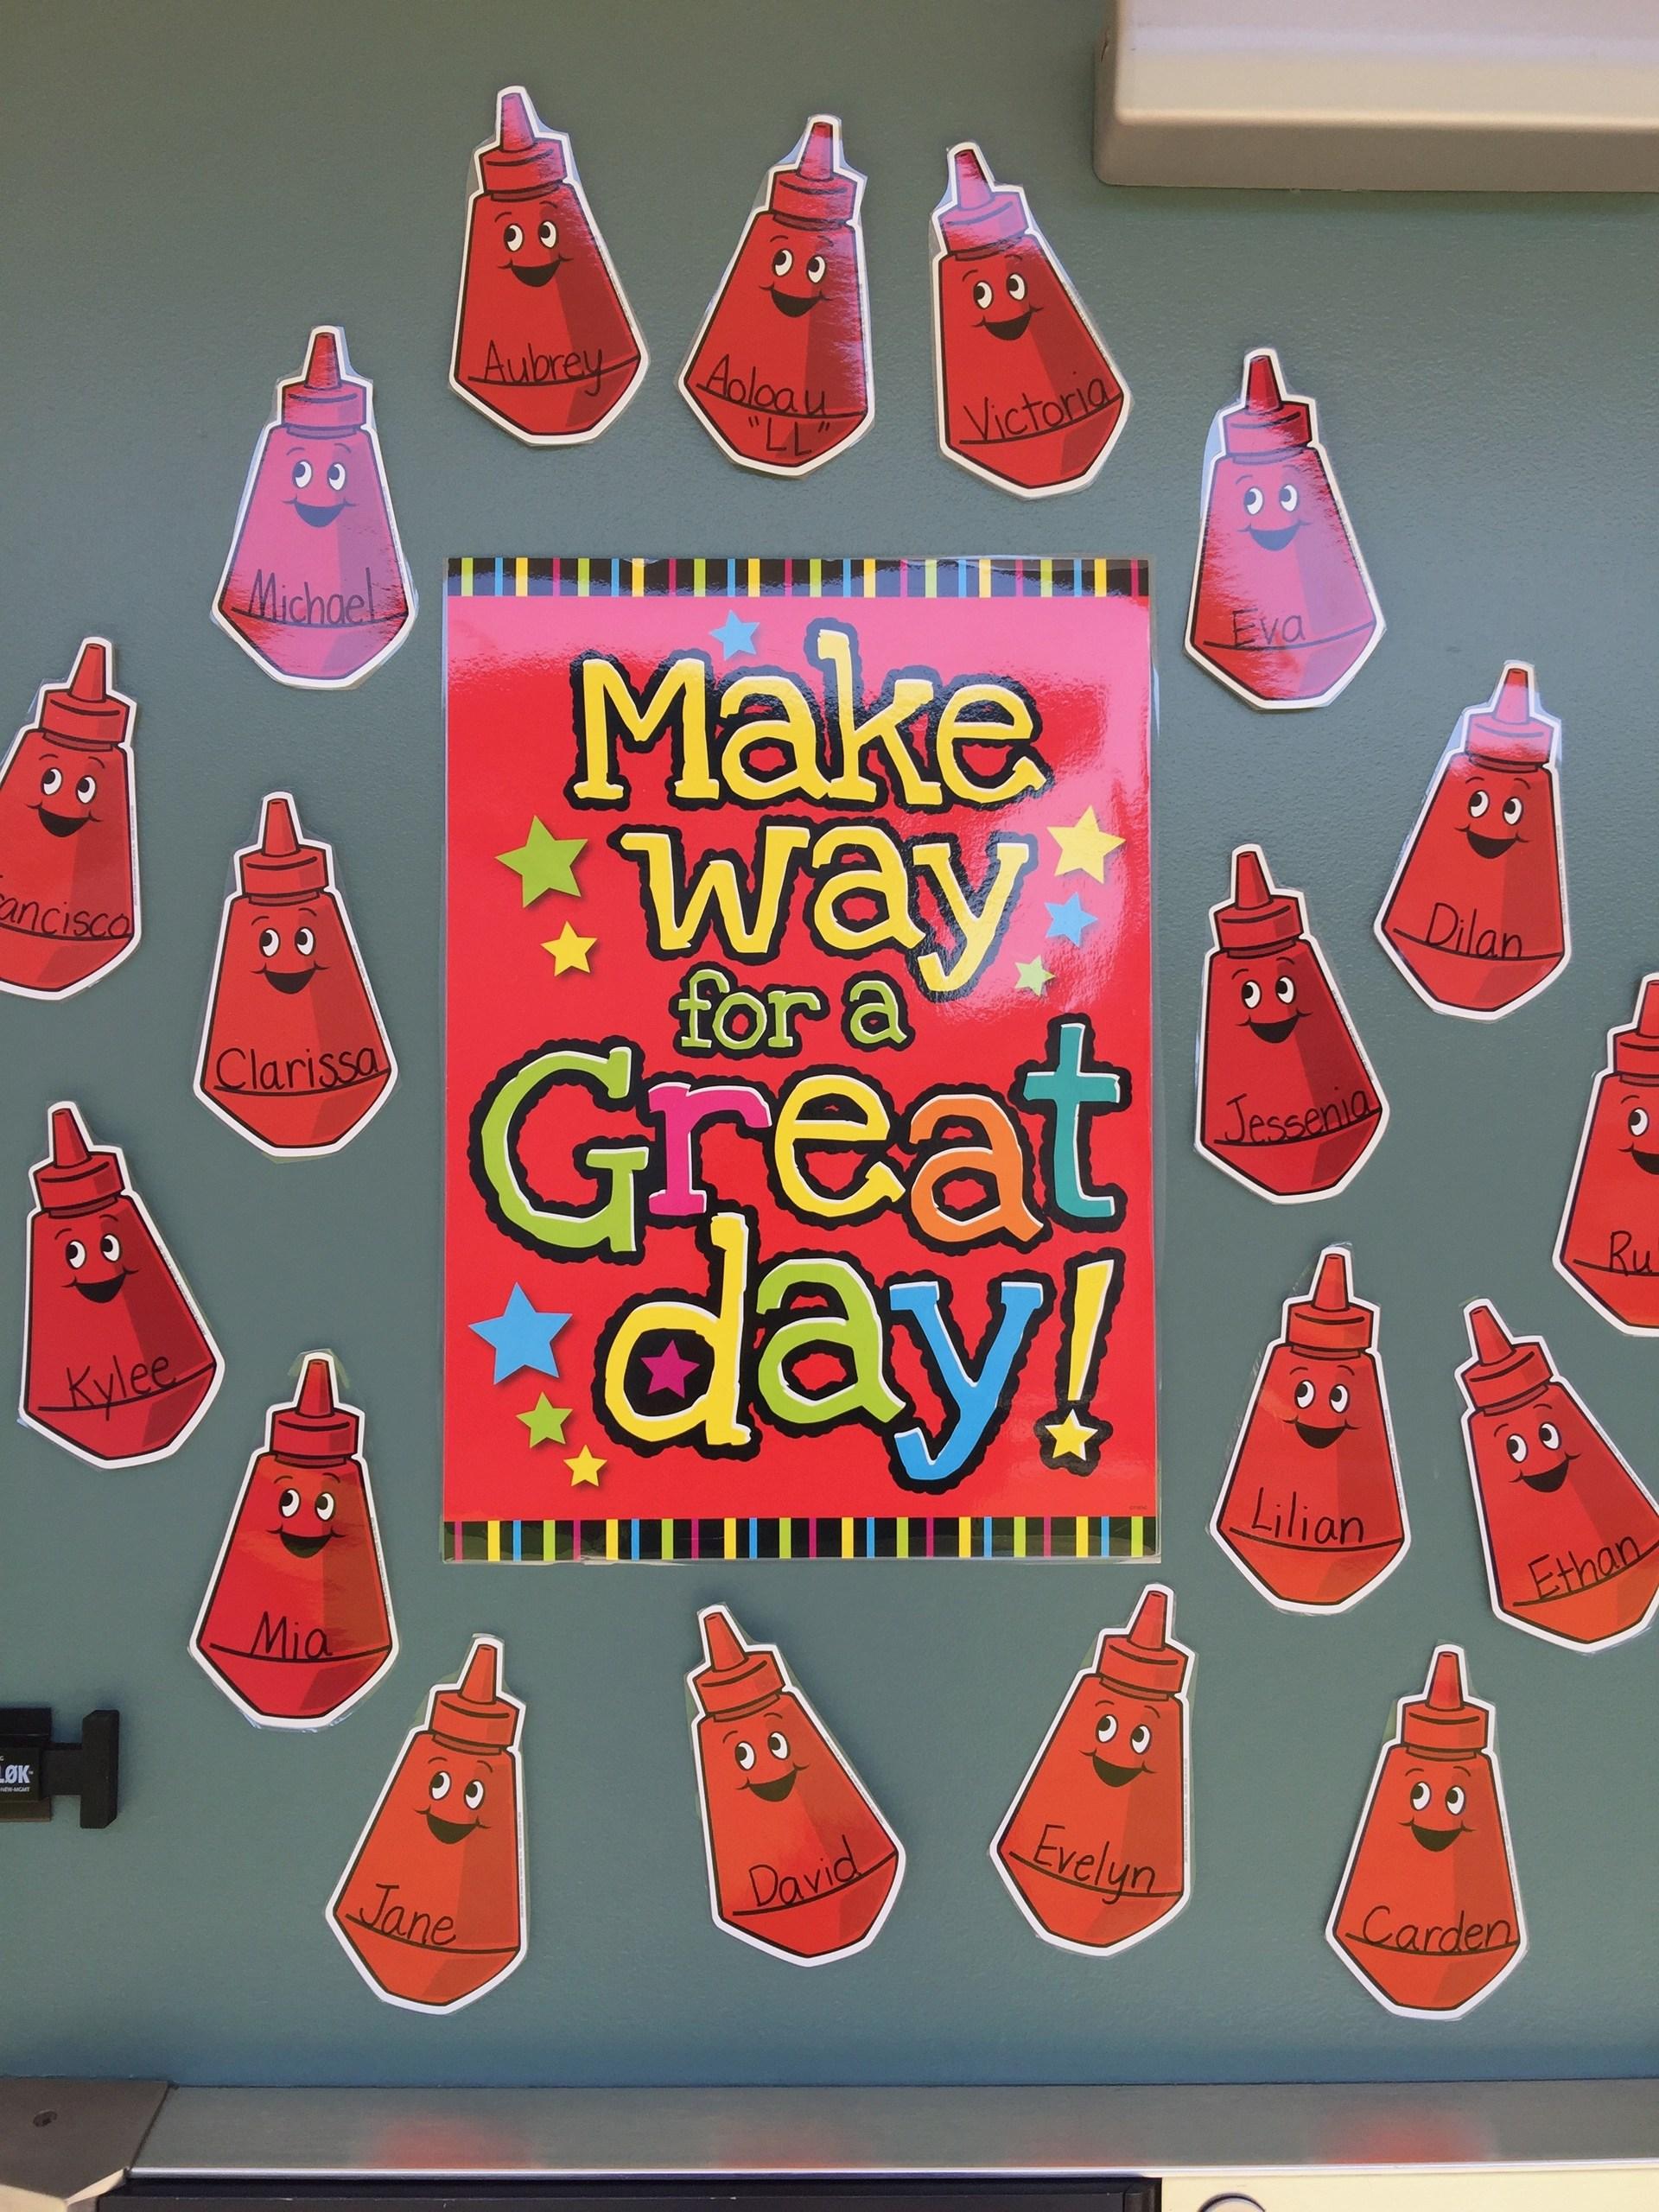 Make it GREAT!